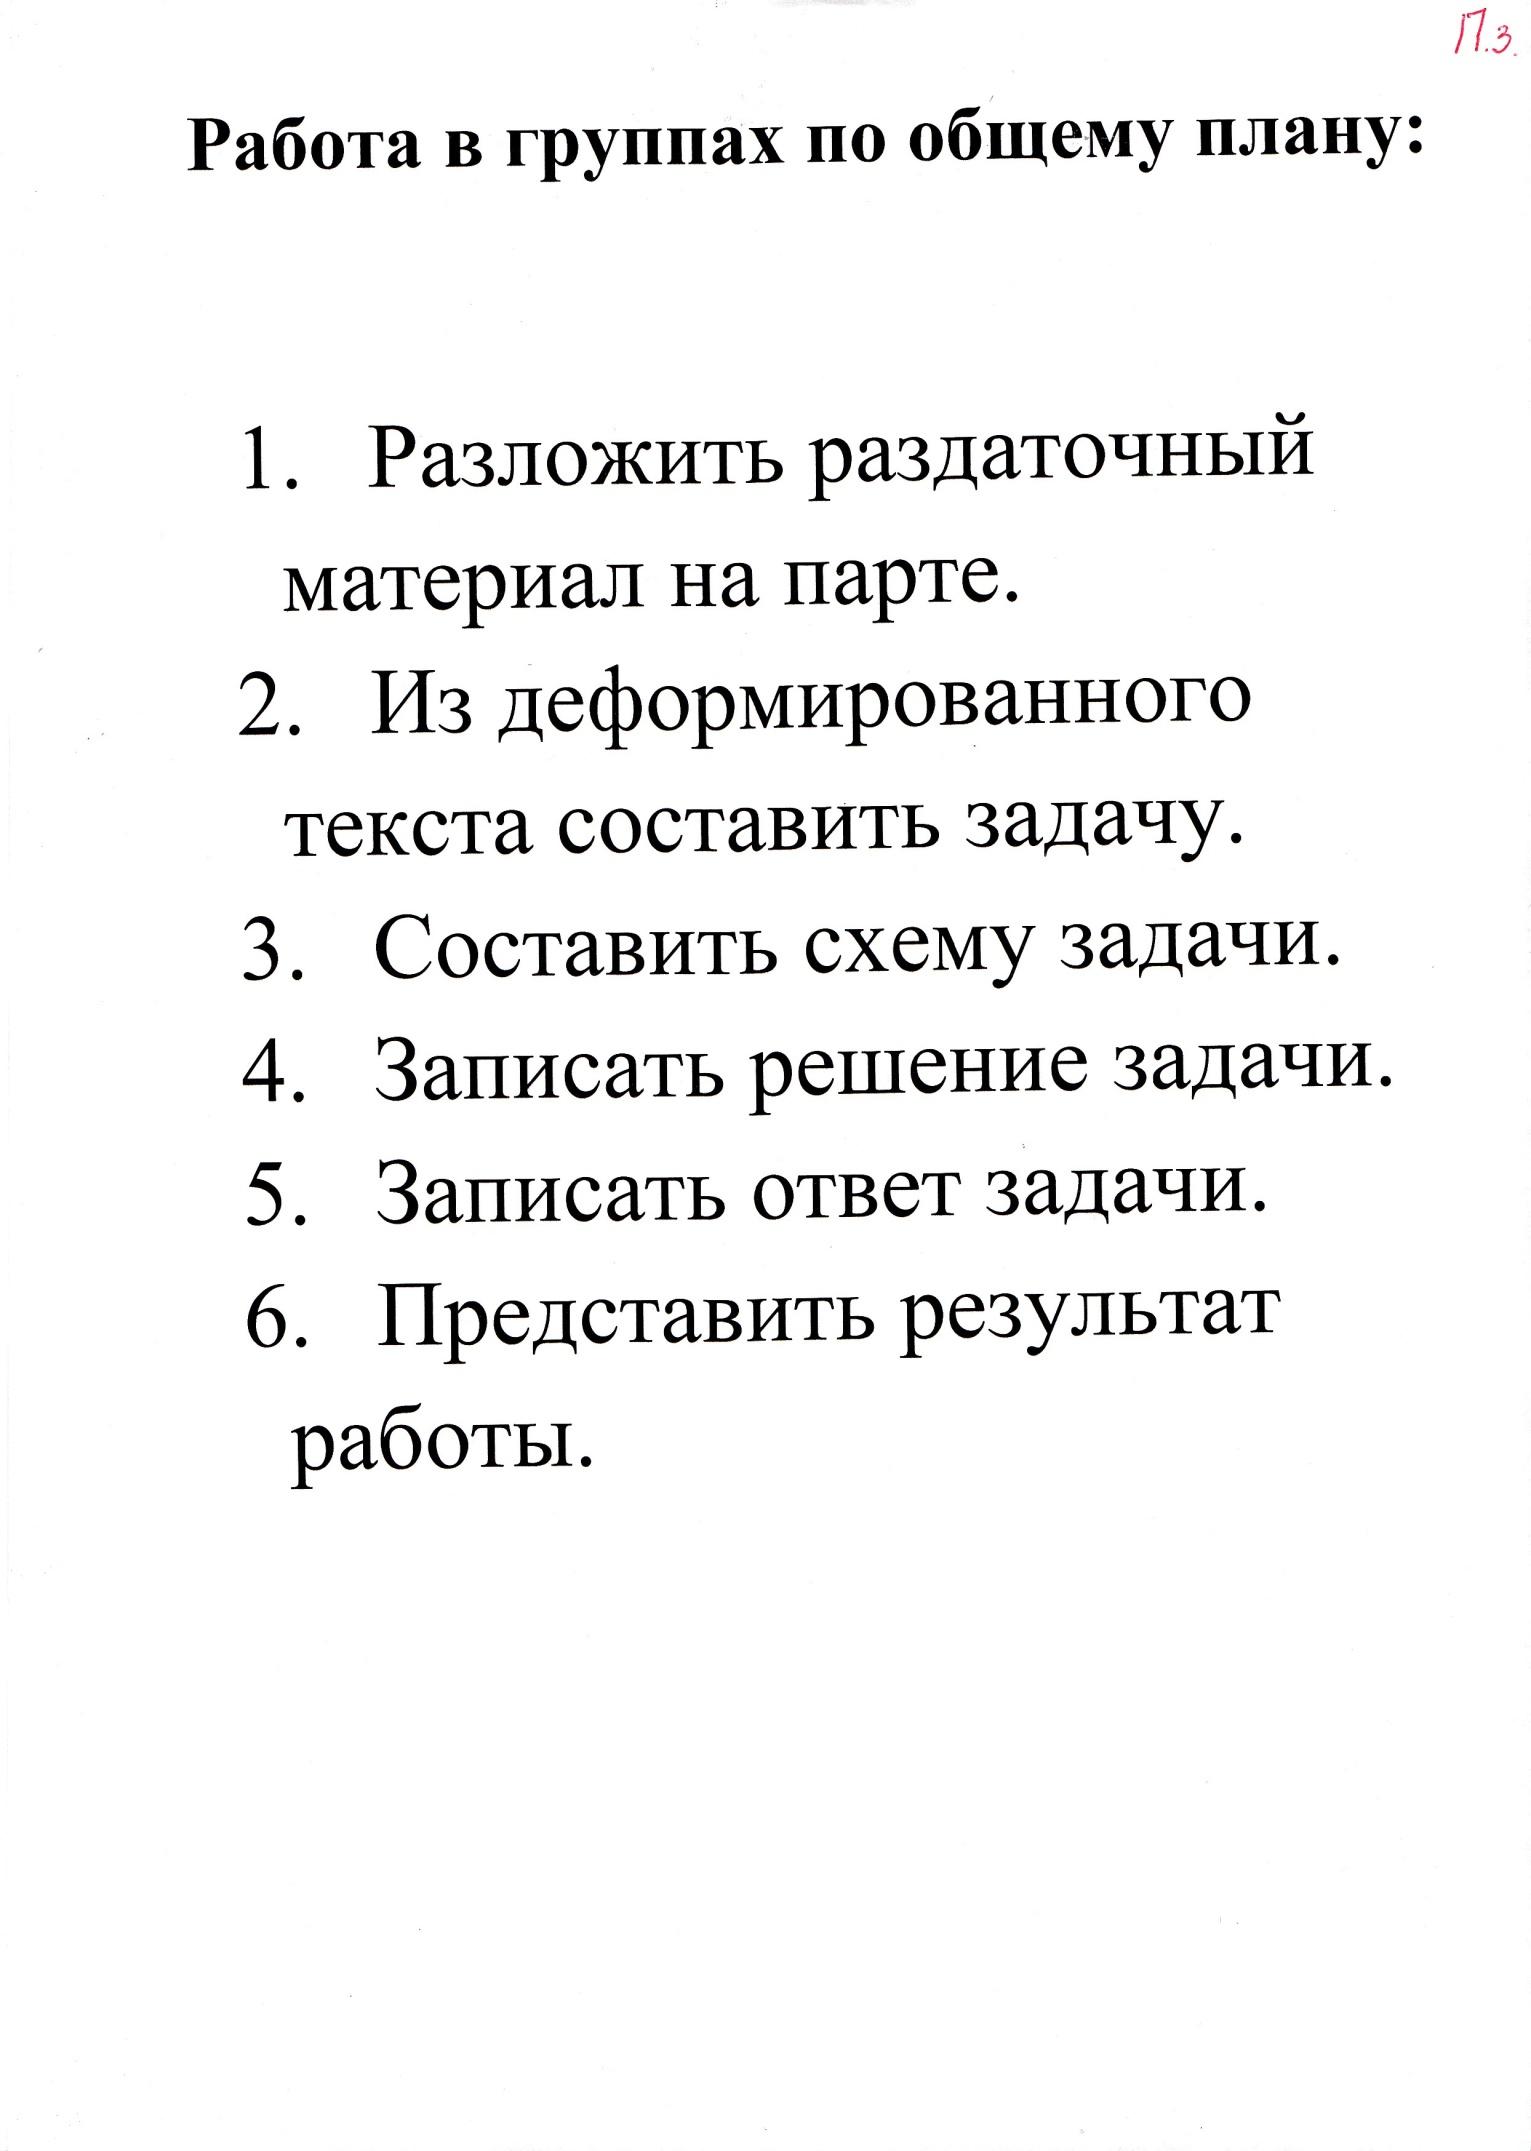 пр.3.jpg